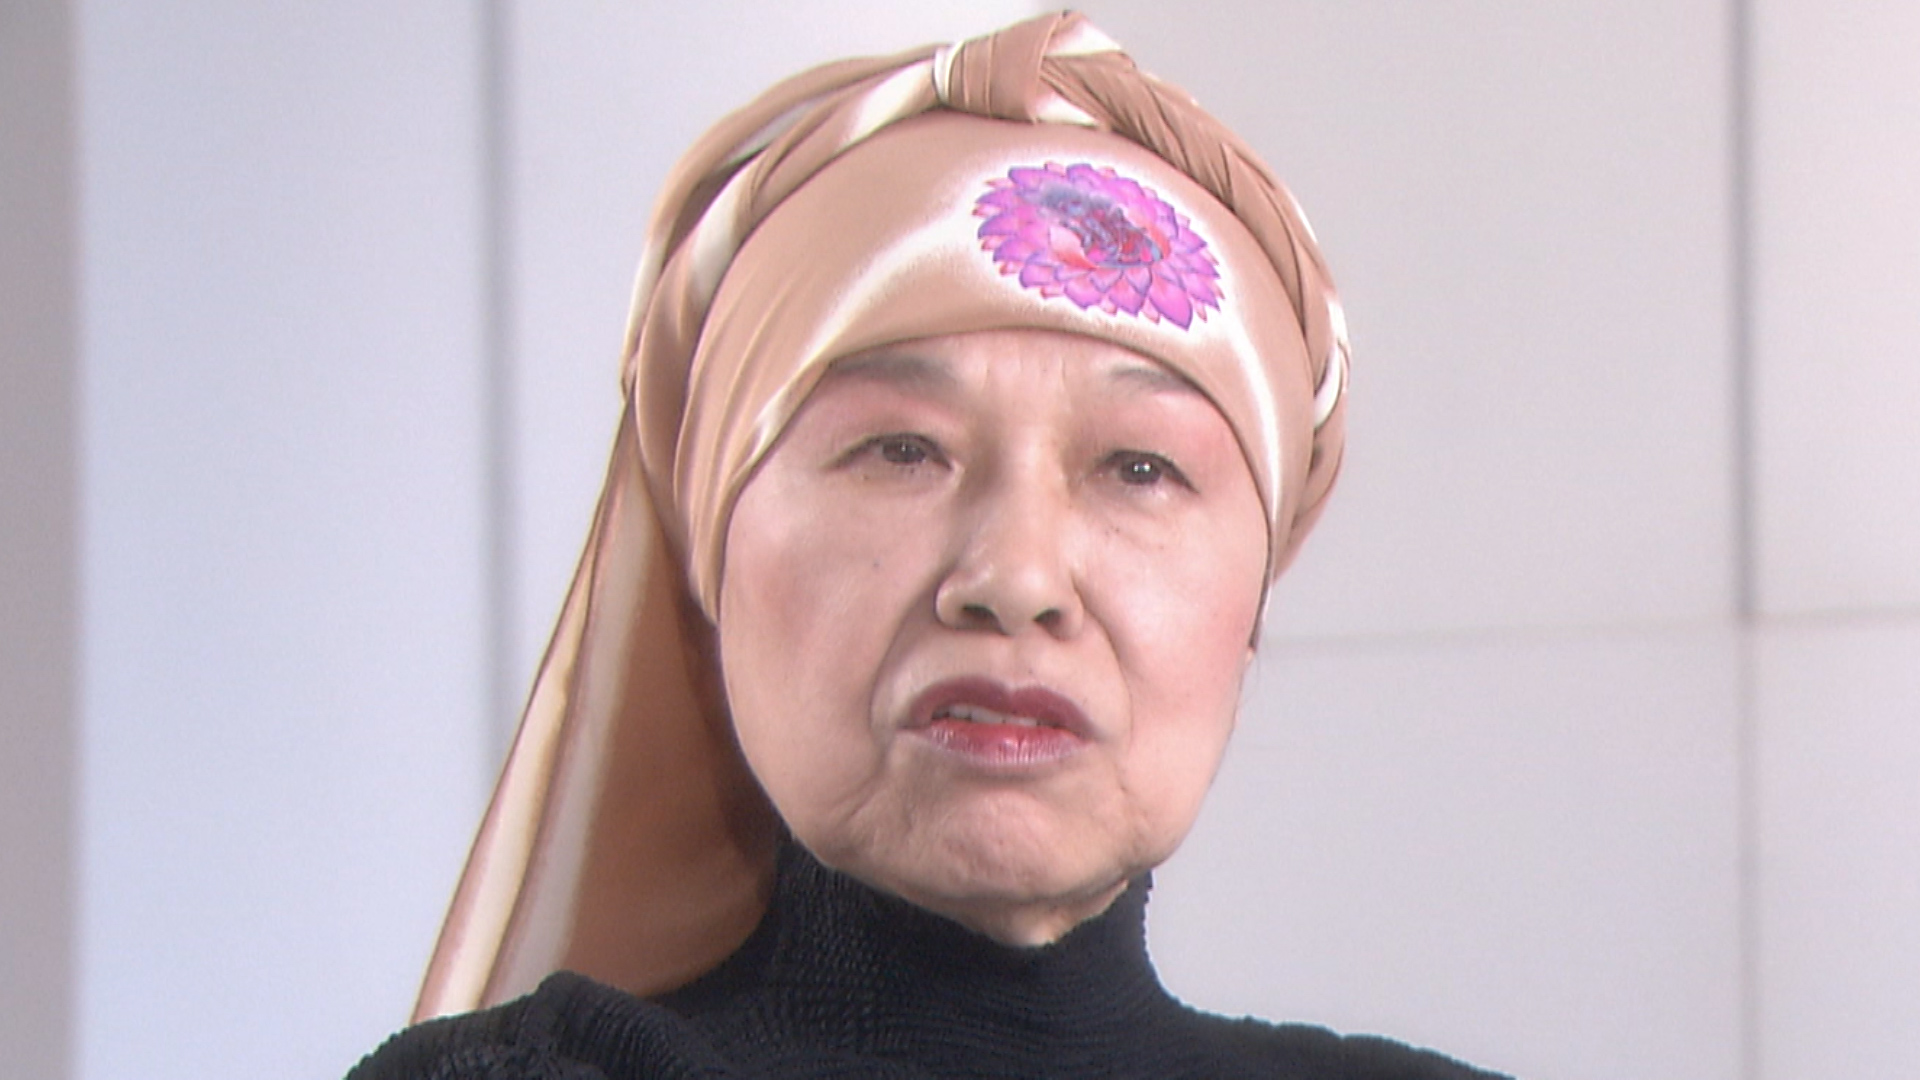 瑛子 石岡